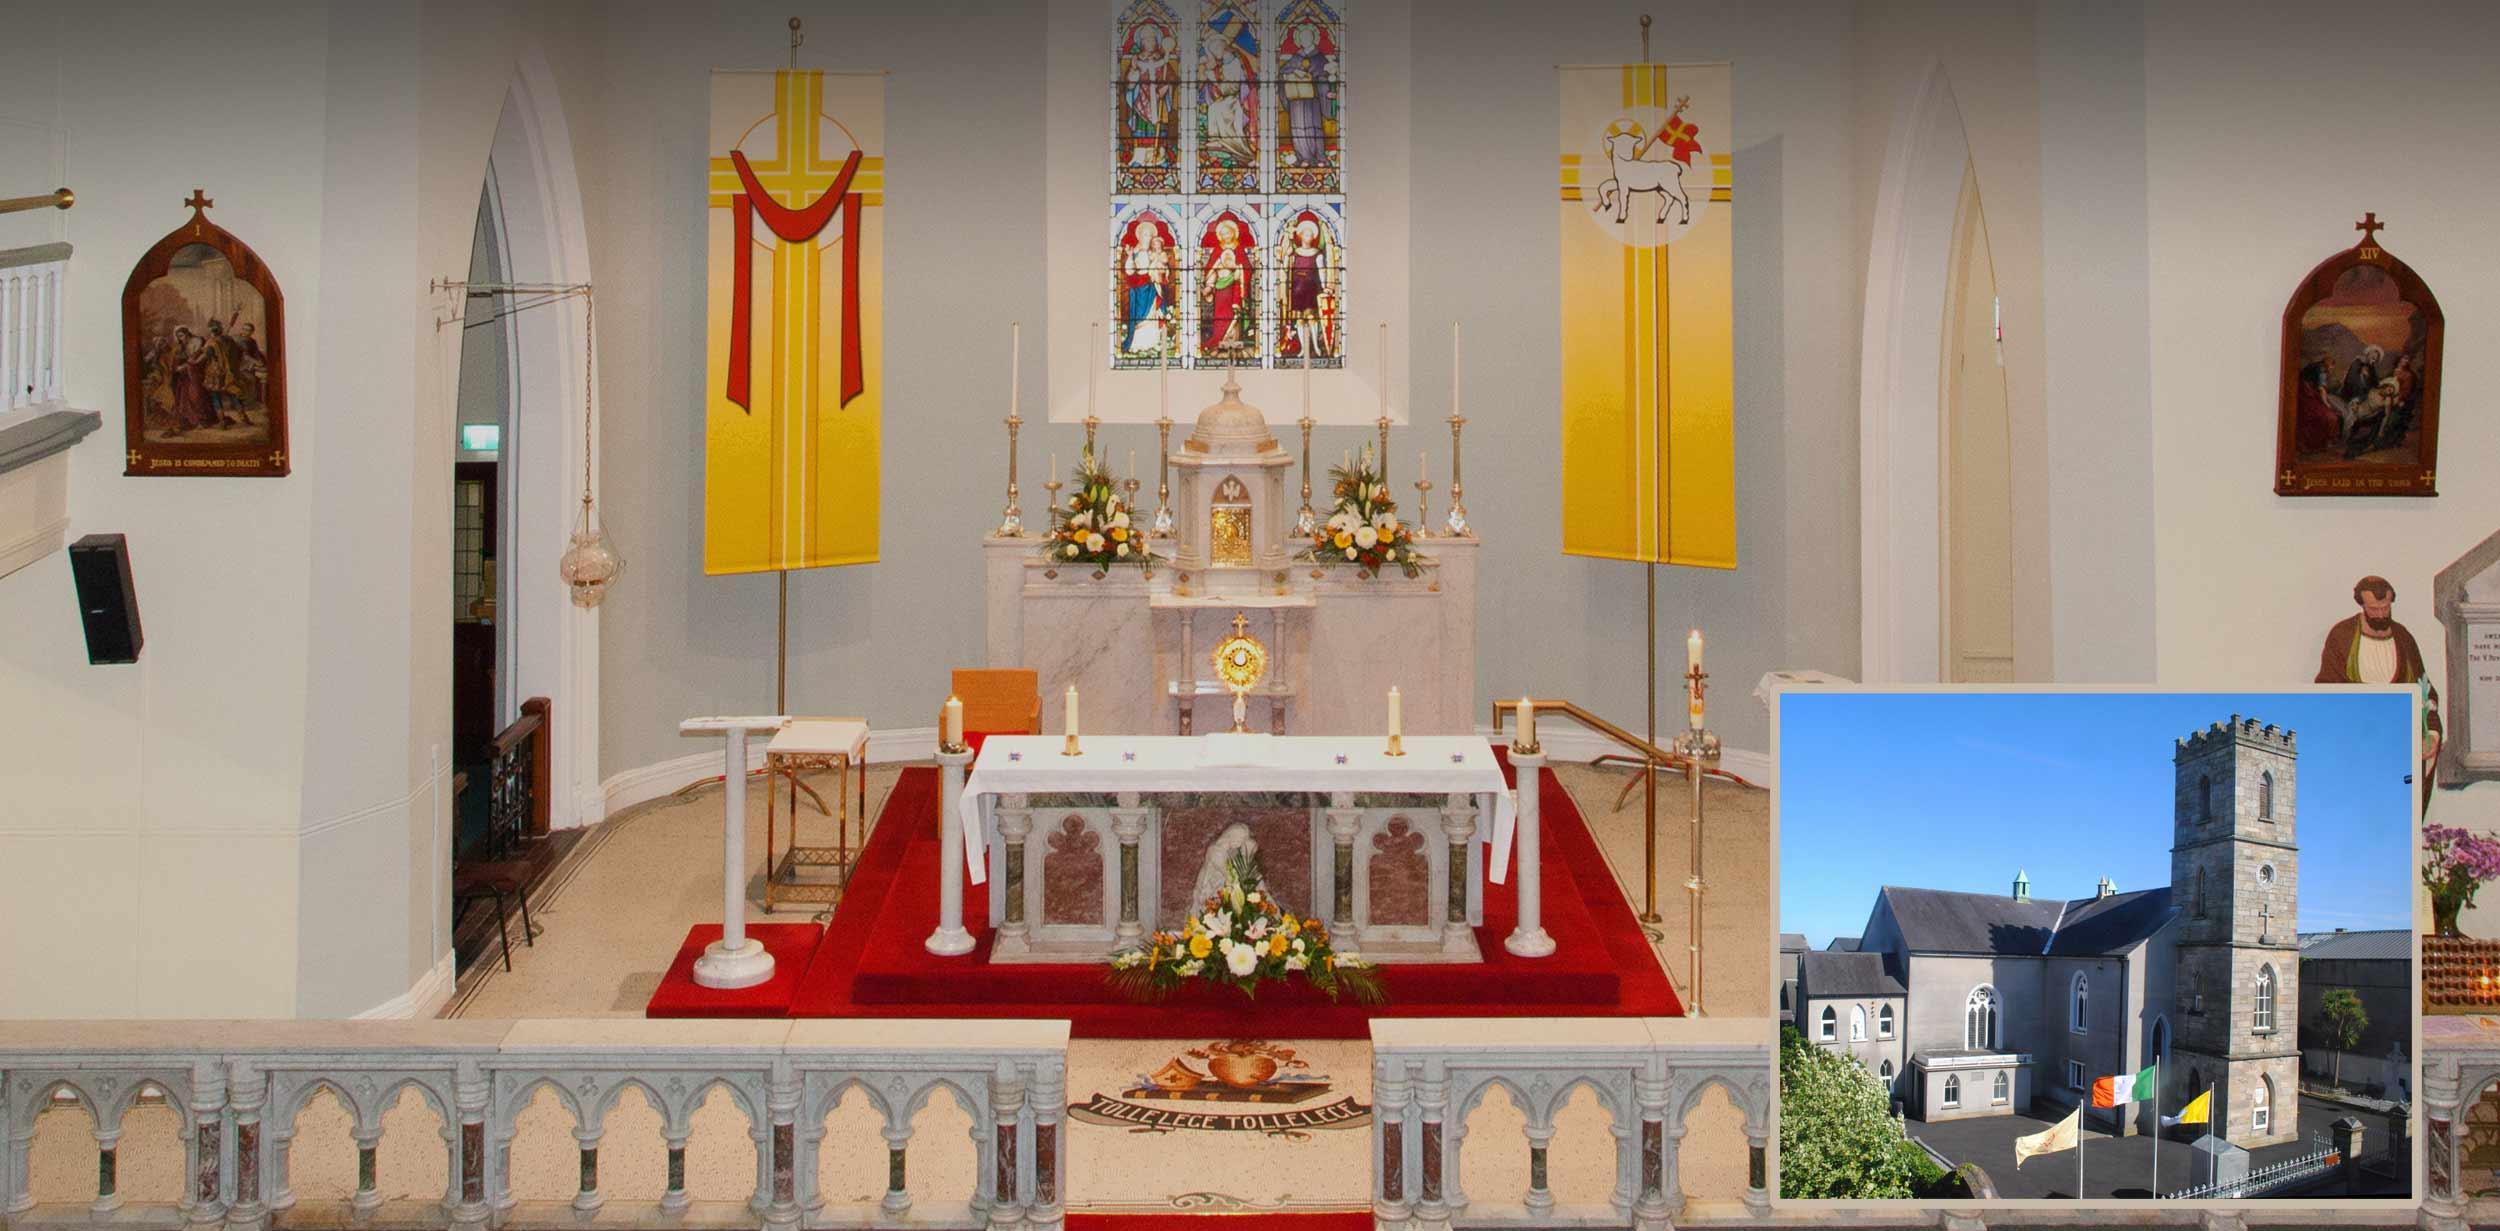 St. Augustine's Church, Dungarvan.